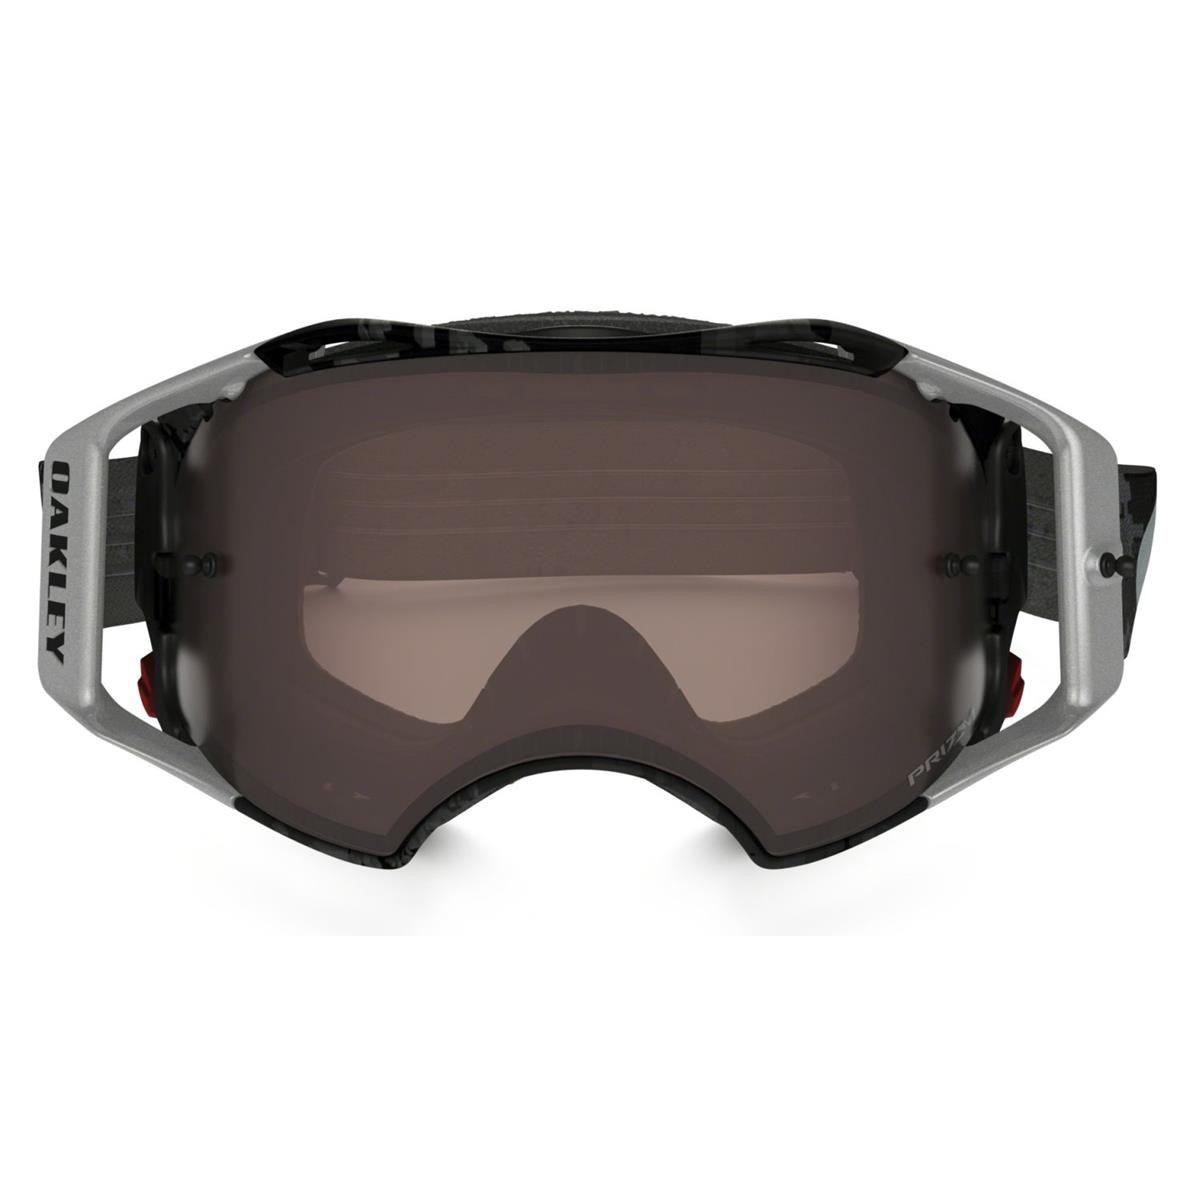 oakley crossbrille gr einheitsgr e goggle mx mtb motocross downhill schutzbril ebay. Black Bedroom Furniture Sets. Home Design Ideas